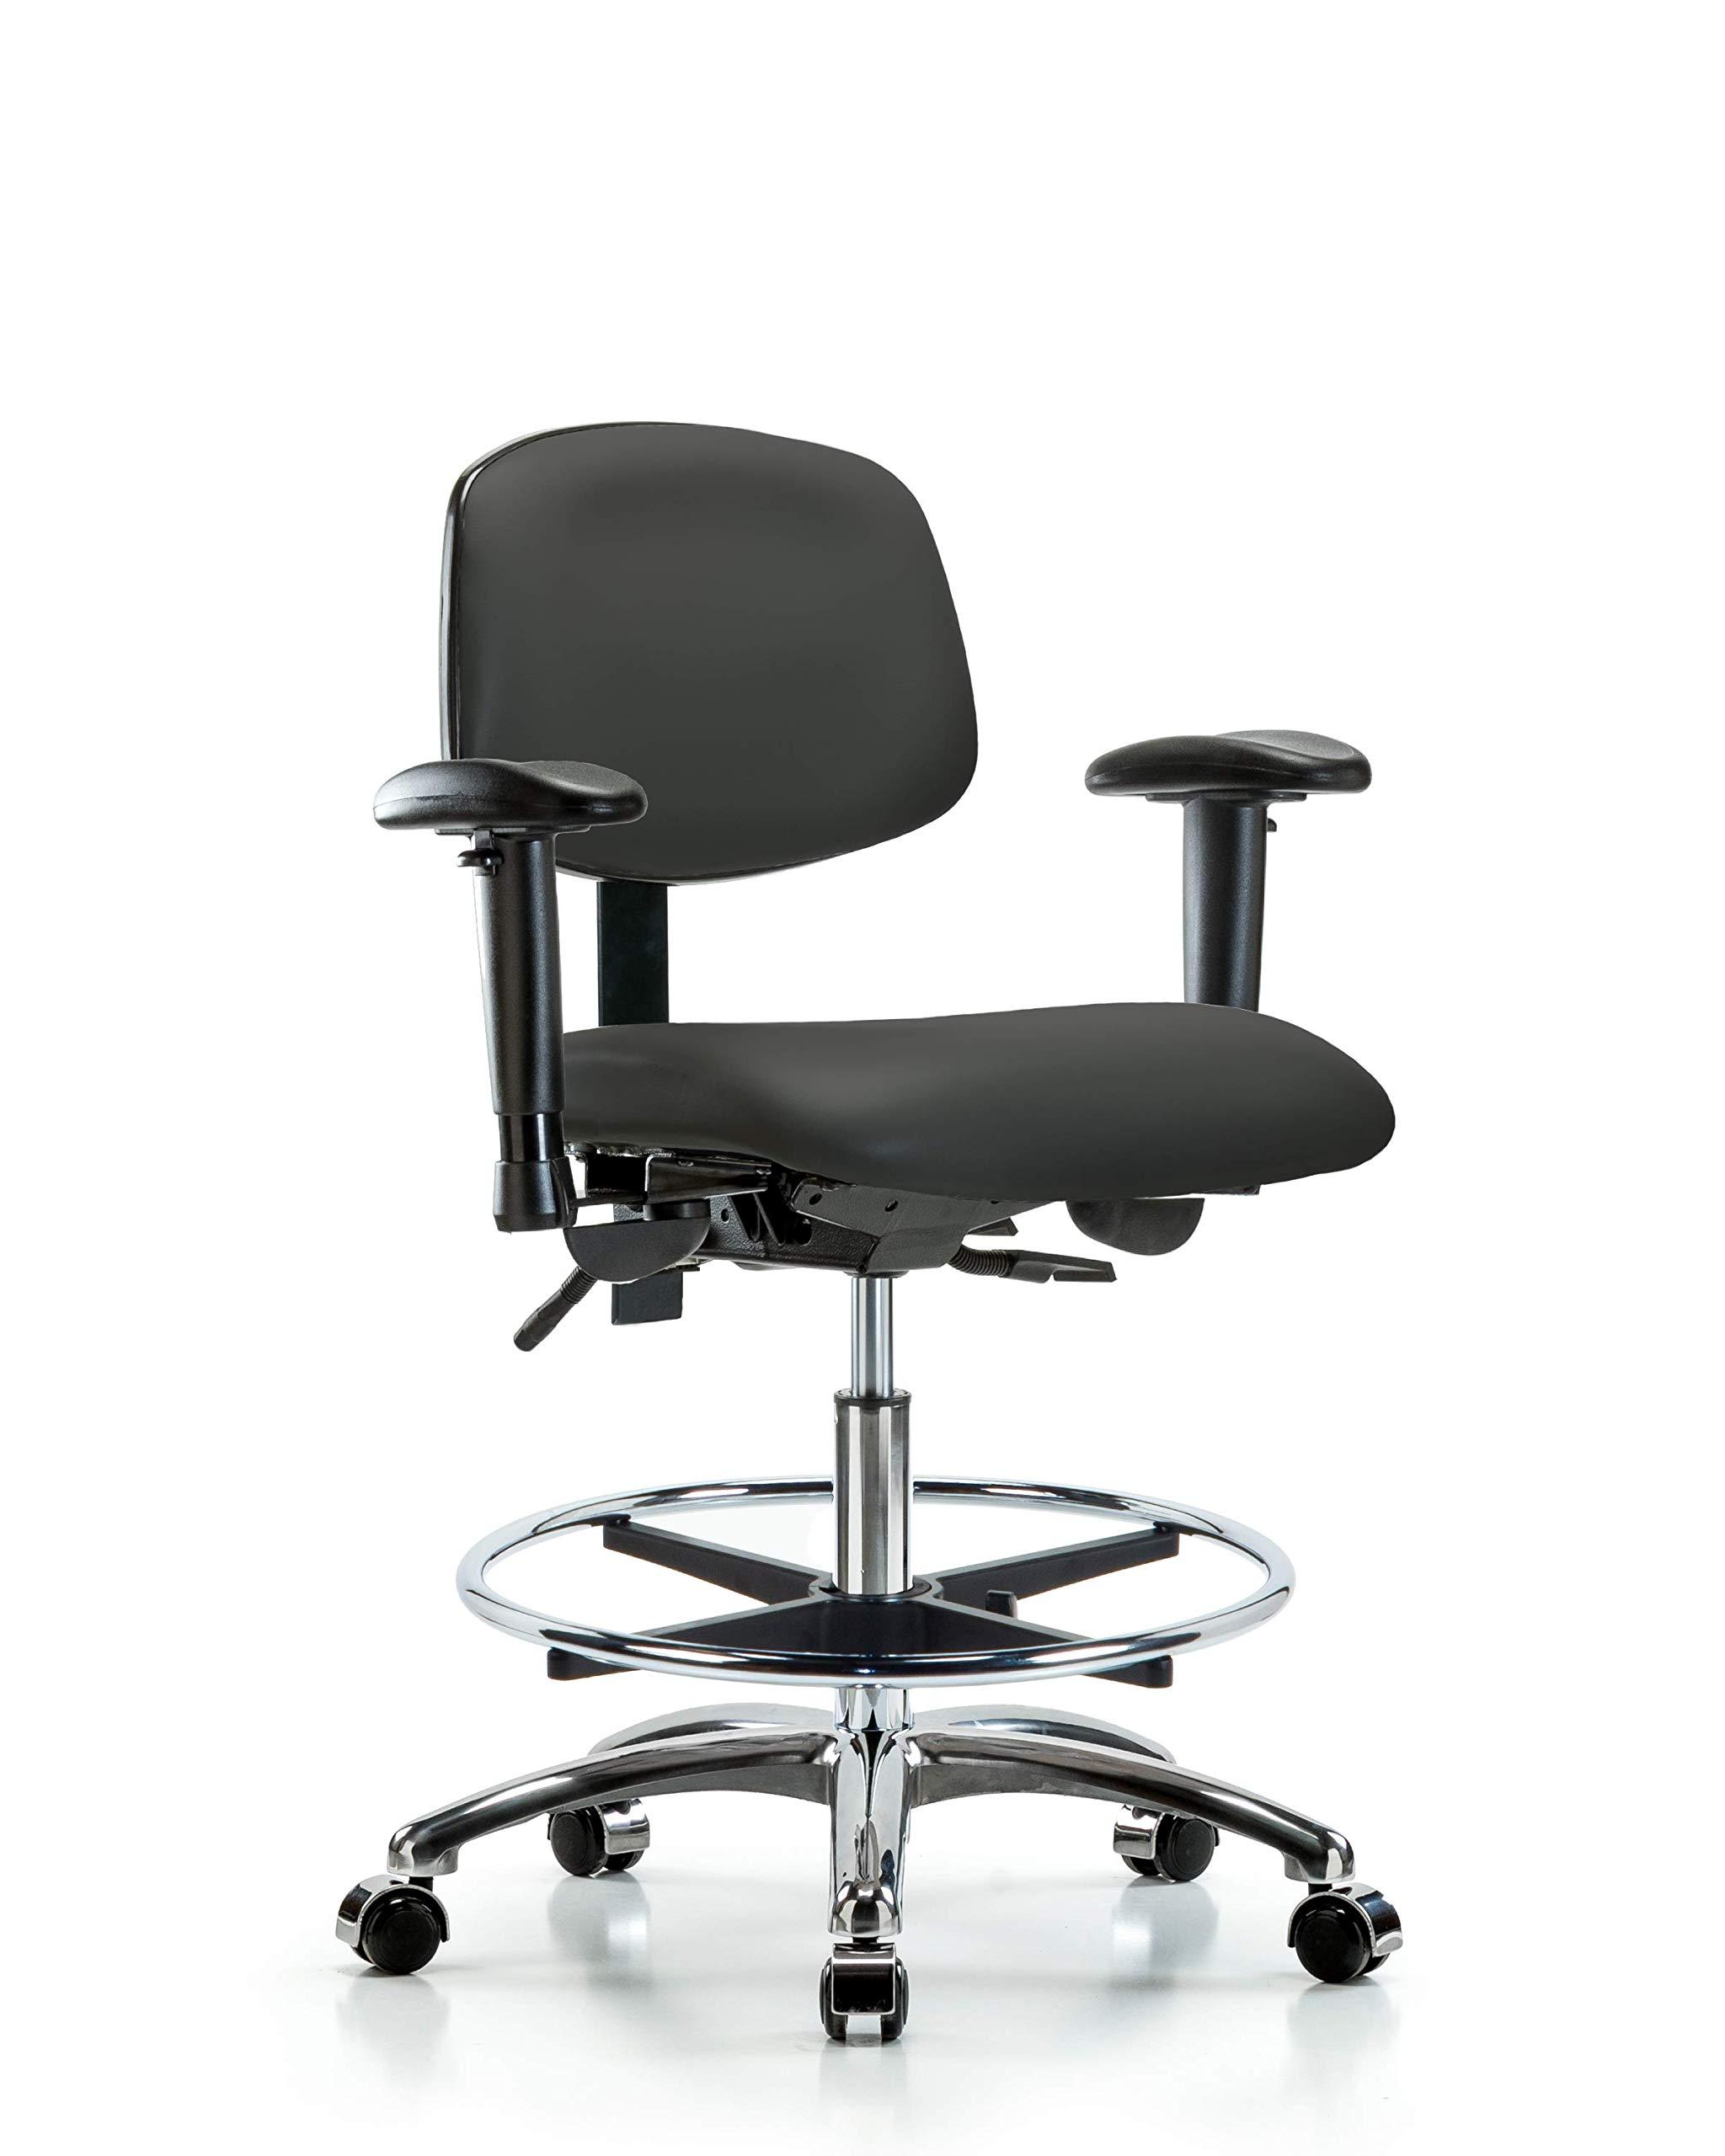 LabTech Seating LT45432 Medium Bench Chair, Vinyl, Chrome Base, Tilt, Arms, Chrome Foot Ring, Chrome Casters, Charcoal